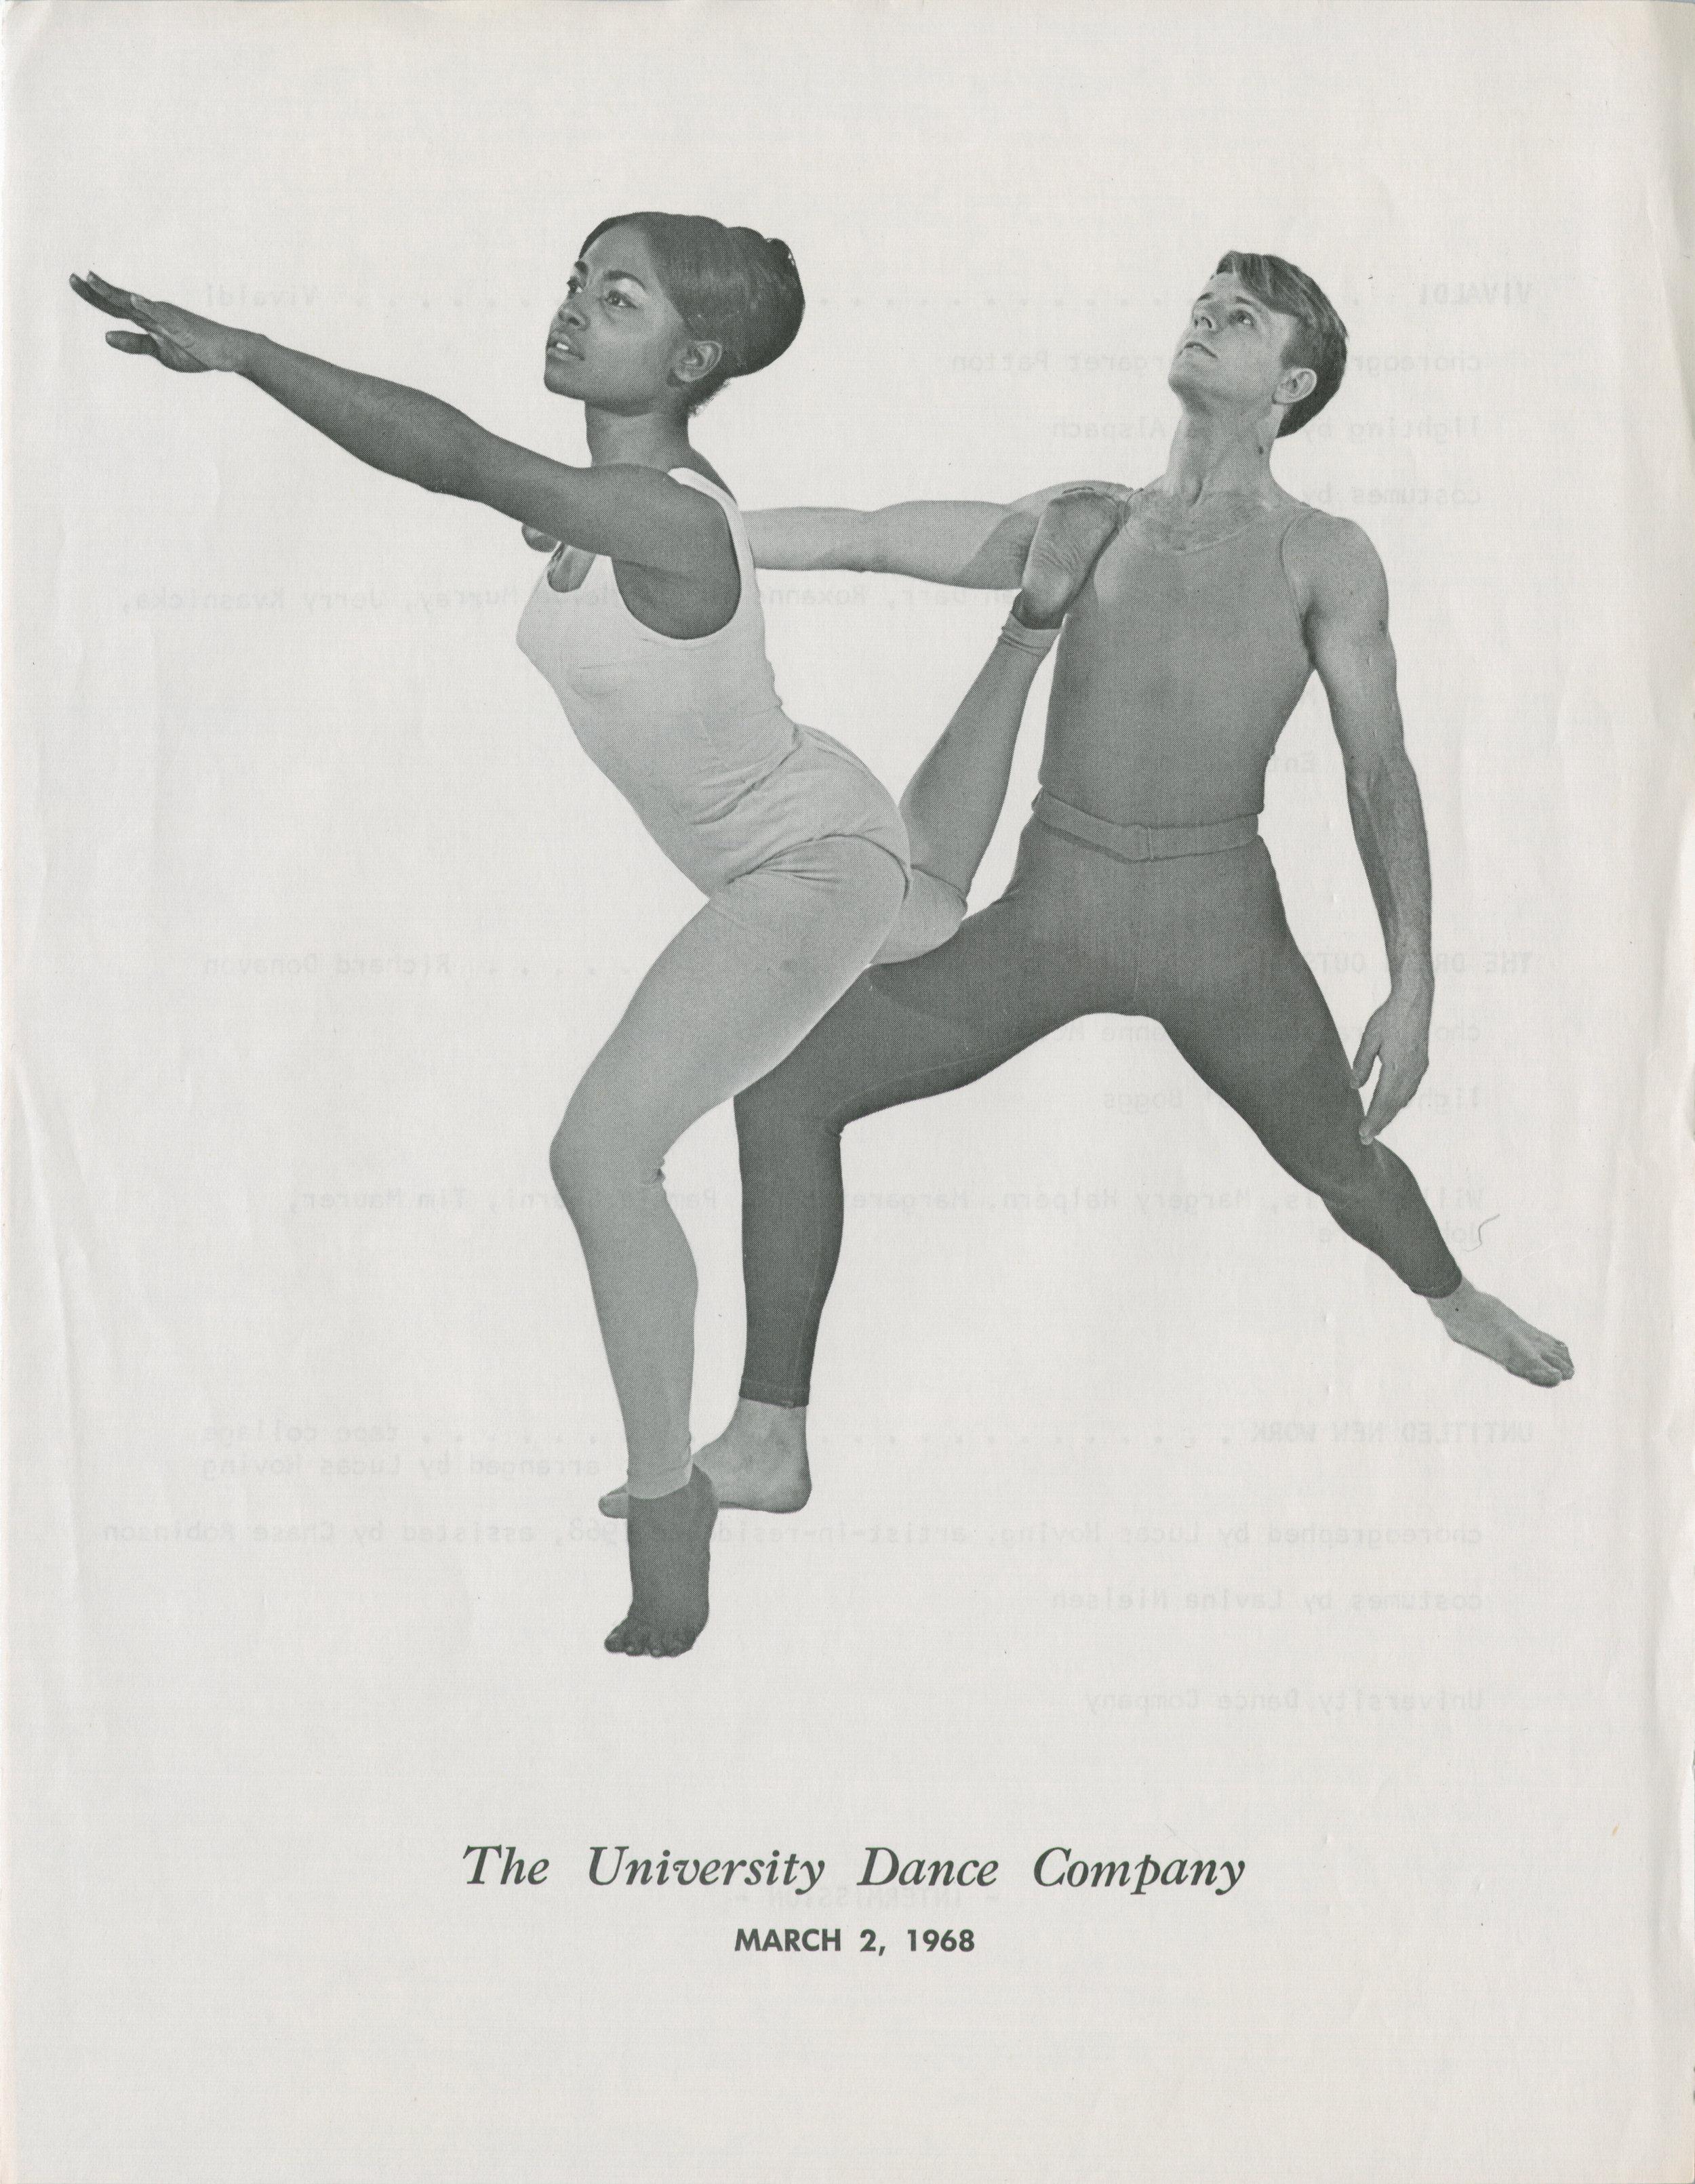 UDC_1968.1_DancePrograms-020-001.jpg